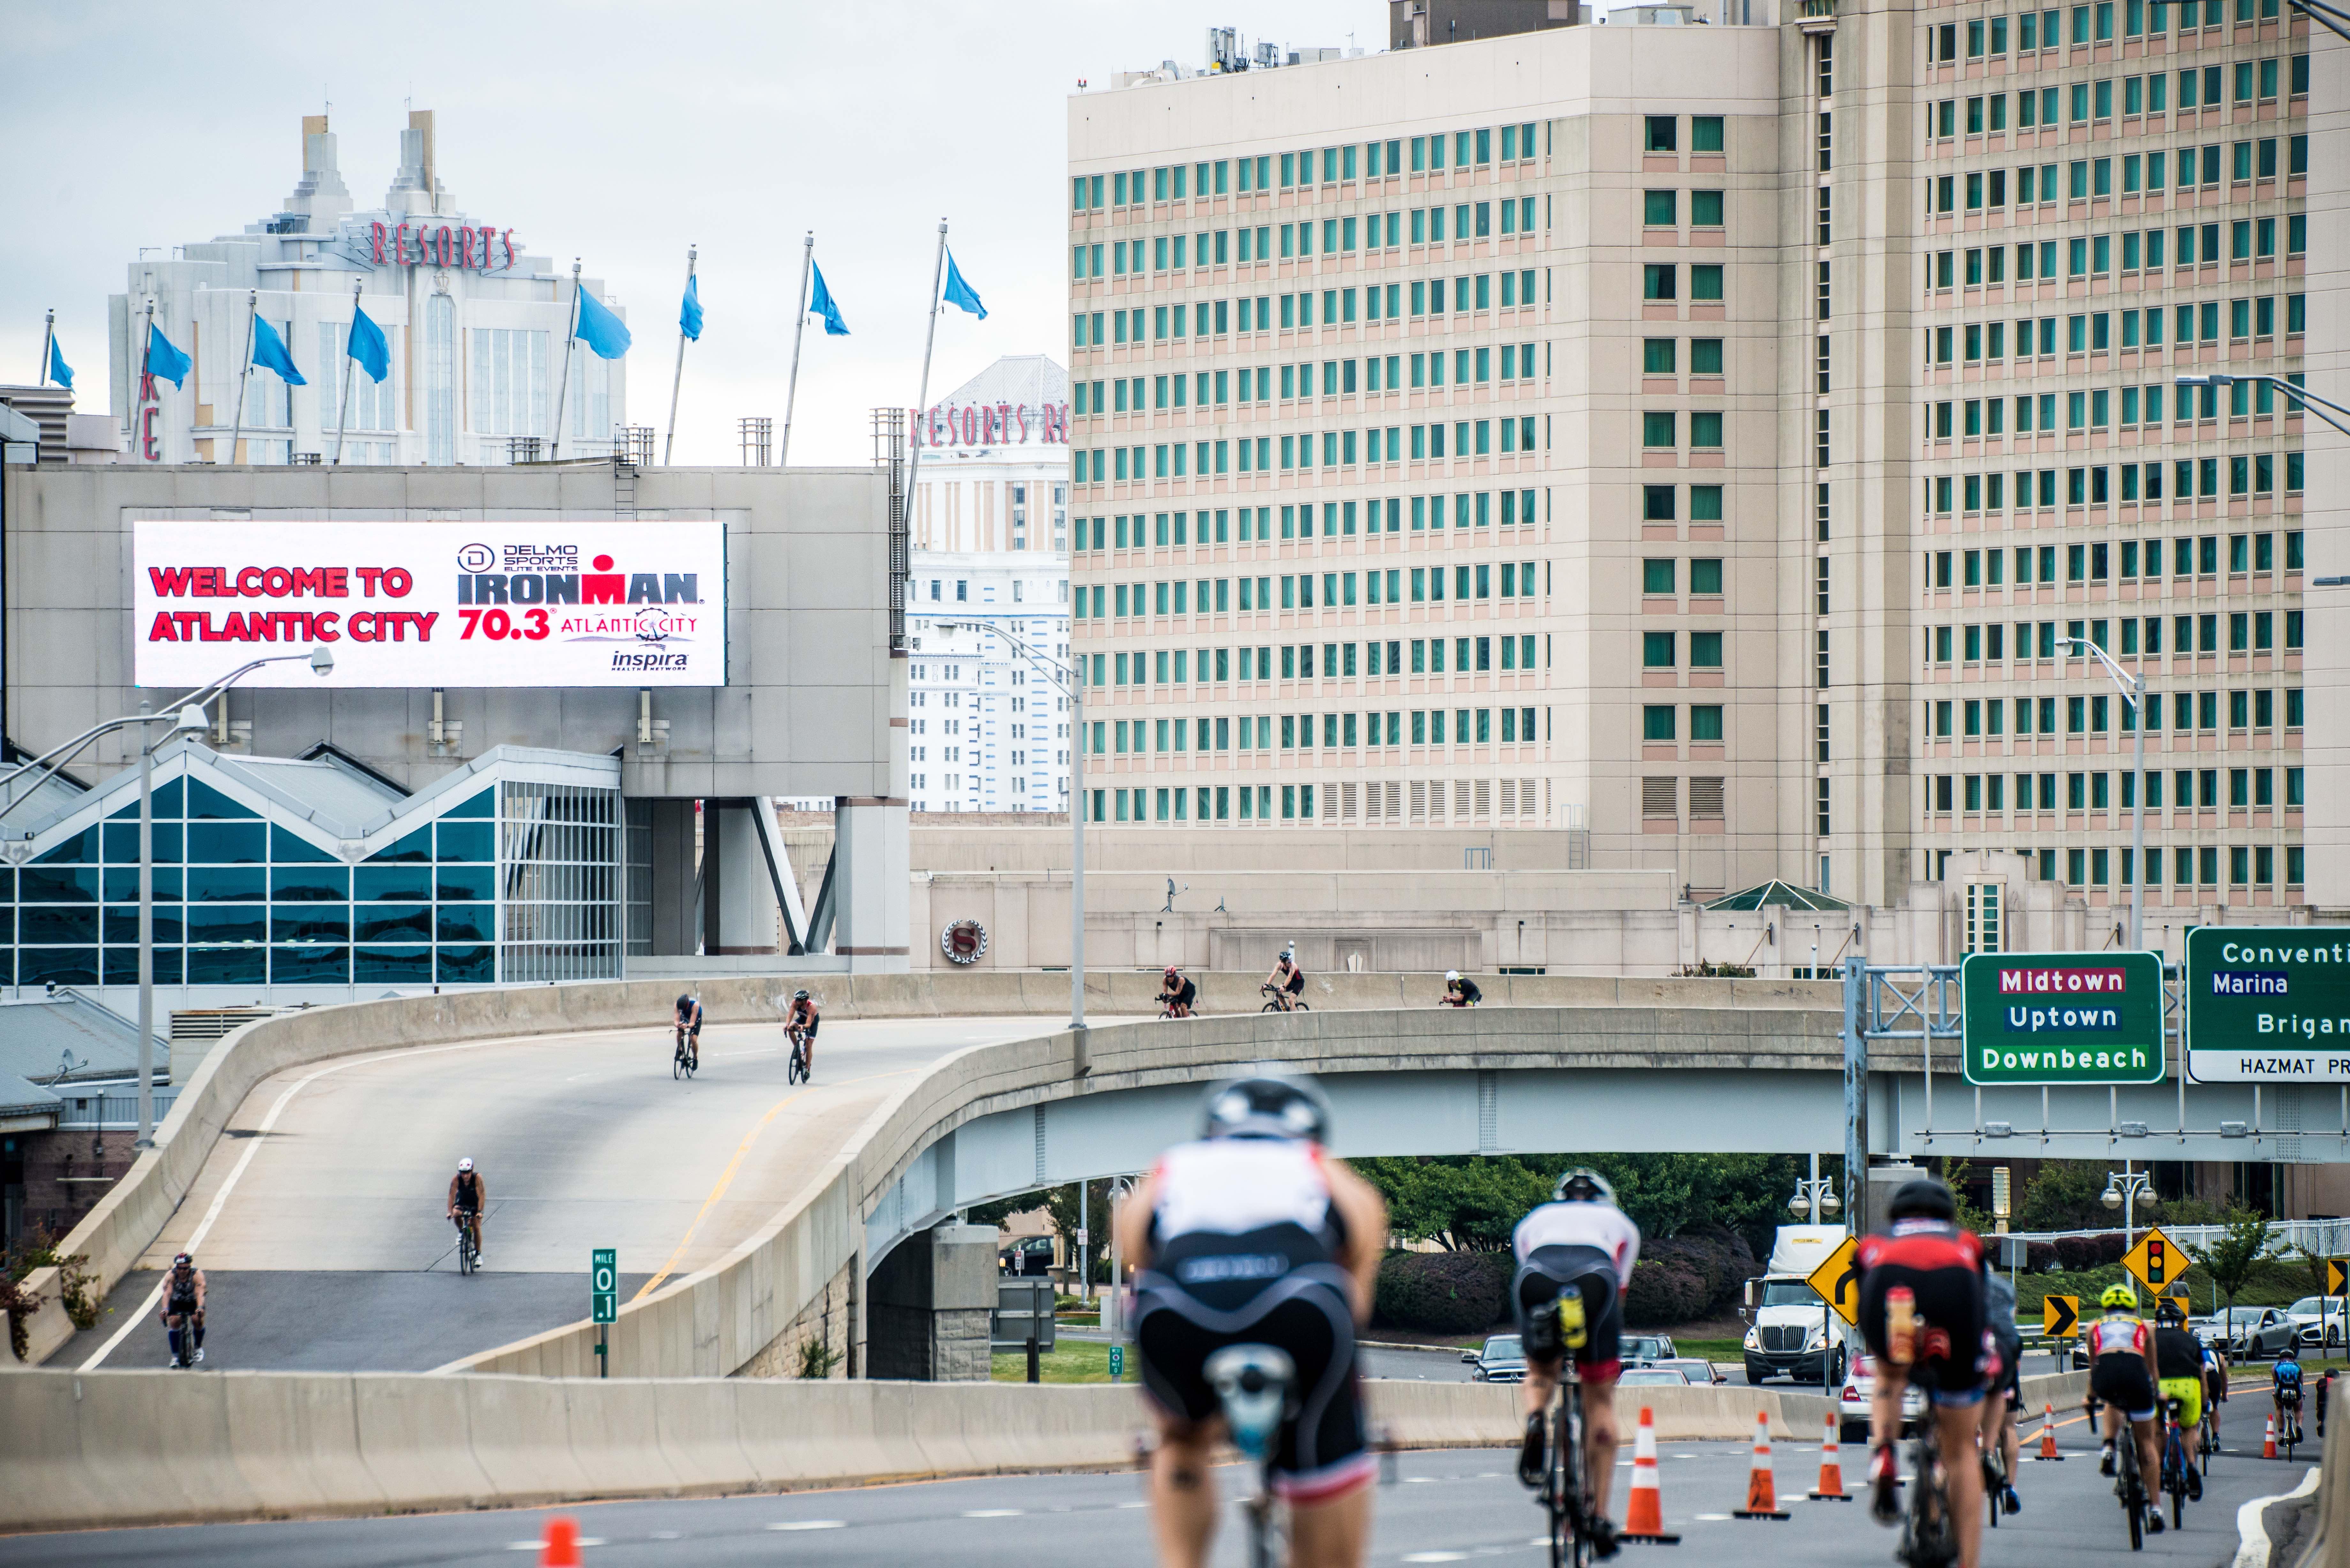 billboard - Ironman 70.3 Atlantic City Copy